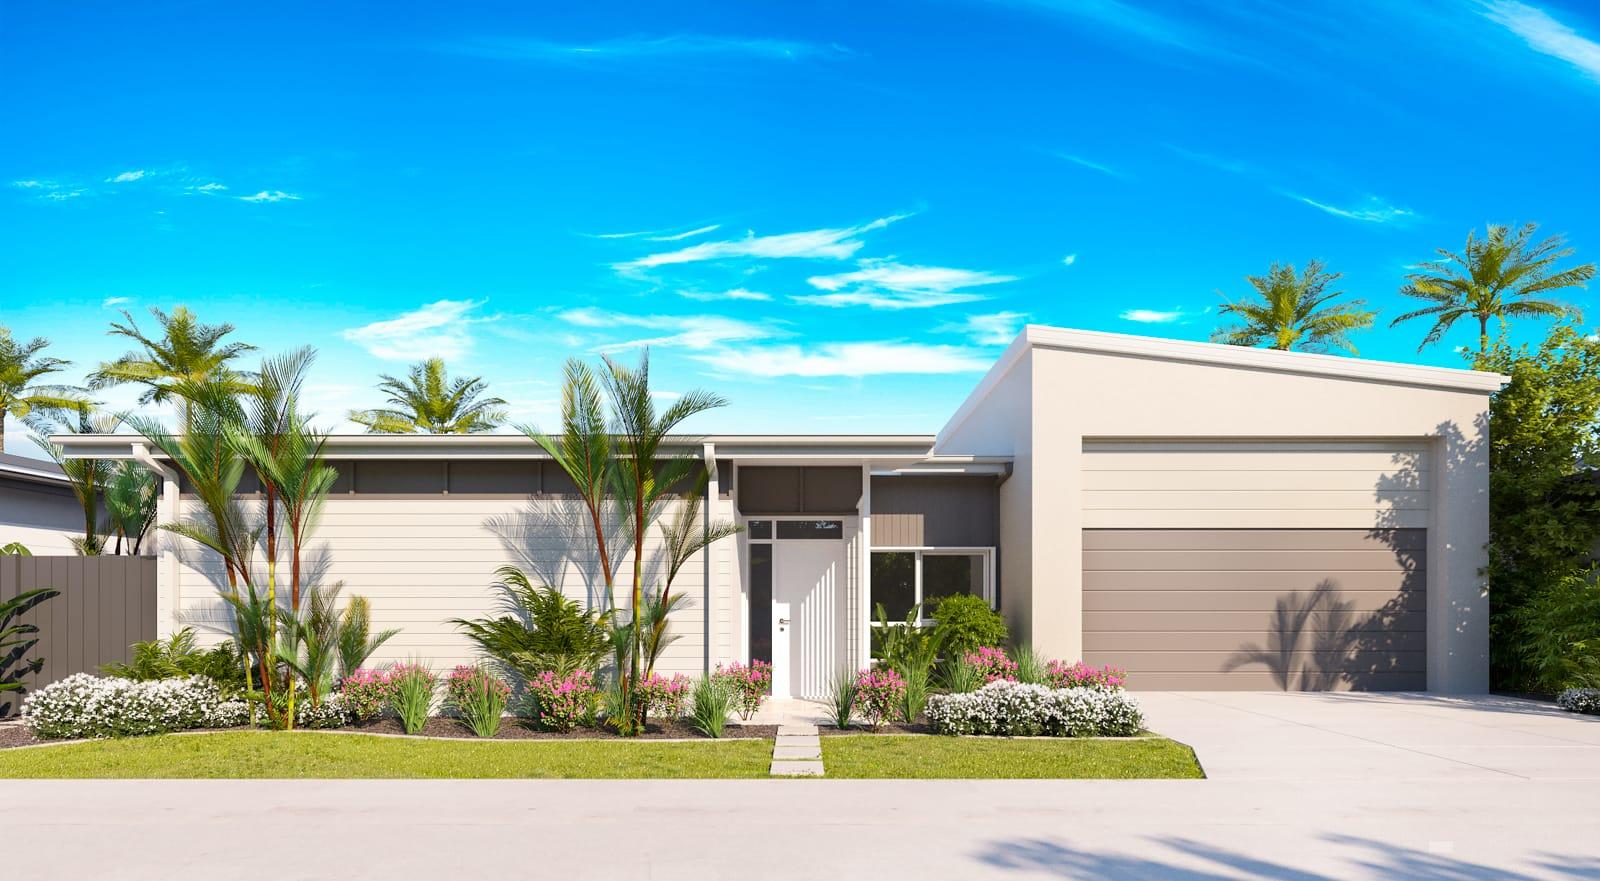 HR WEB L25 House Lot 186 Franklin RGB V2 1 - Latest Releases - 2B